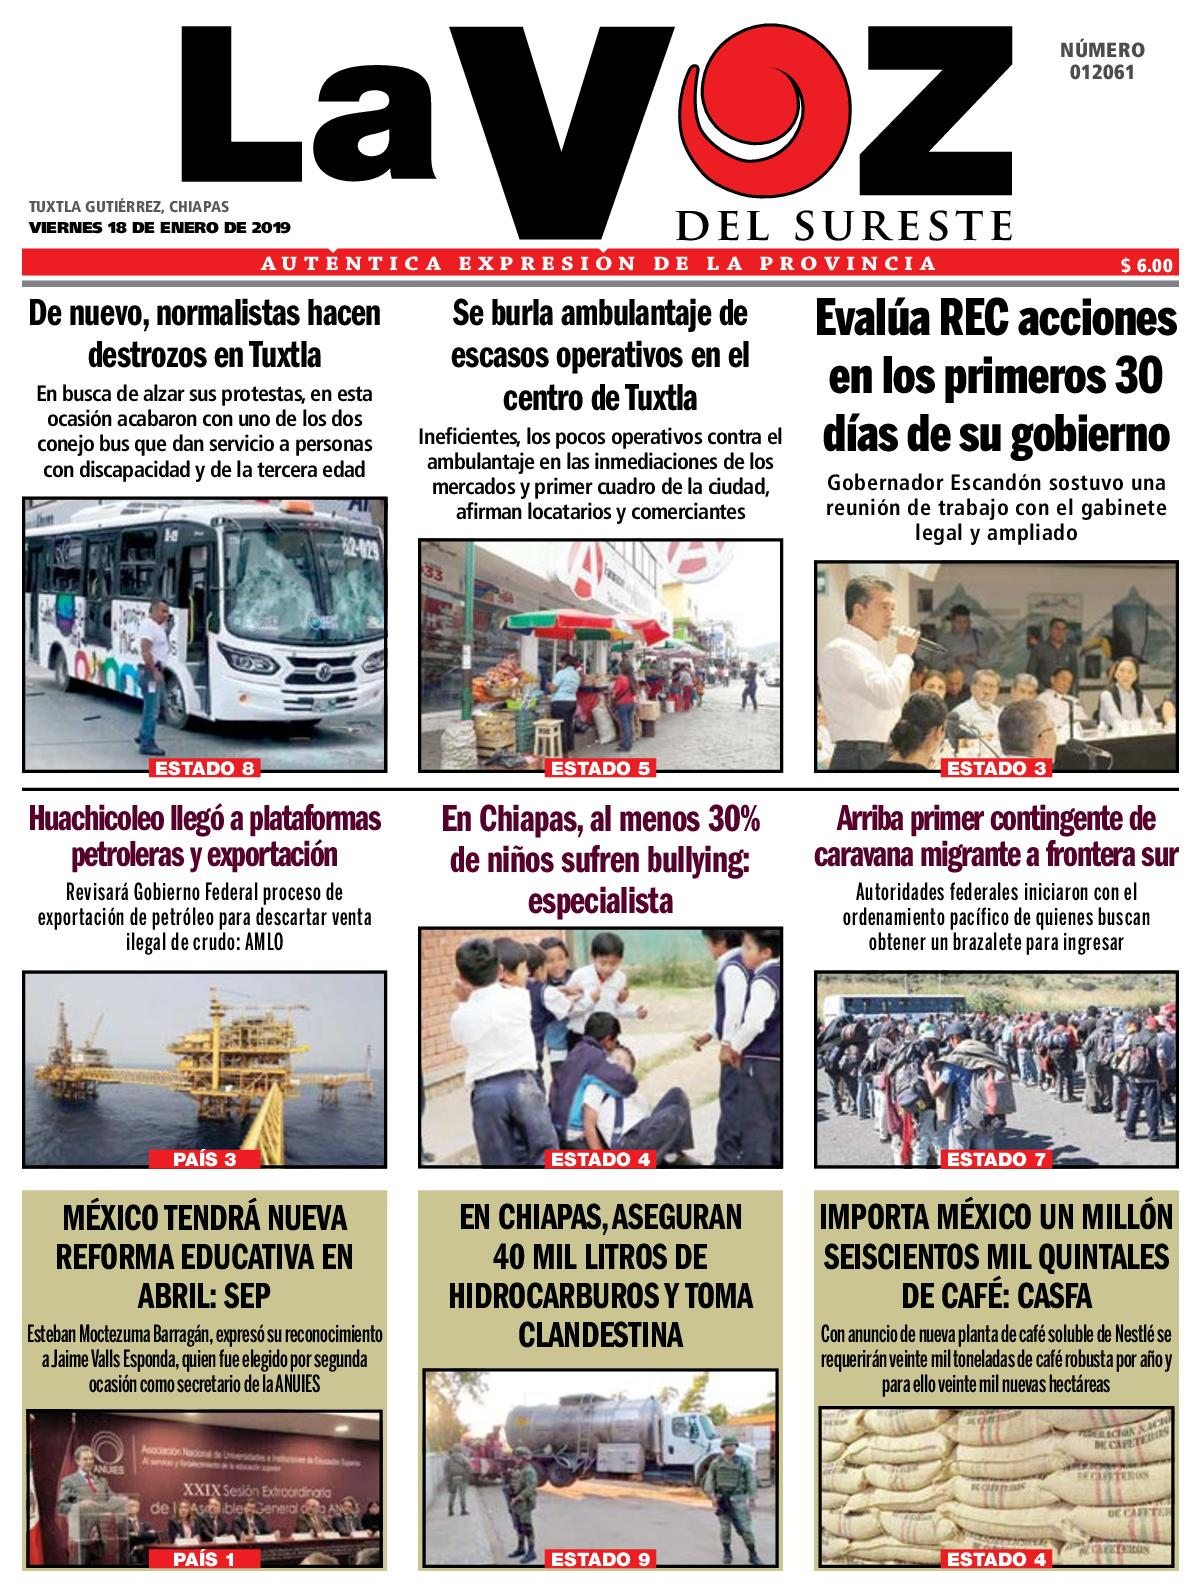 ae04b50dc7c Calaméo - Diario La Voz del Sureste 18-01-2019